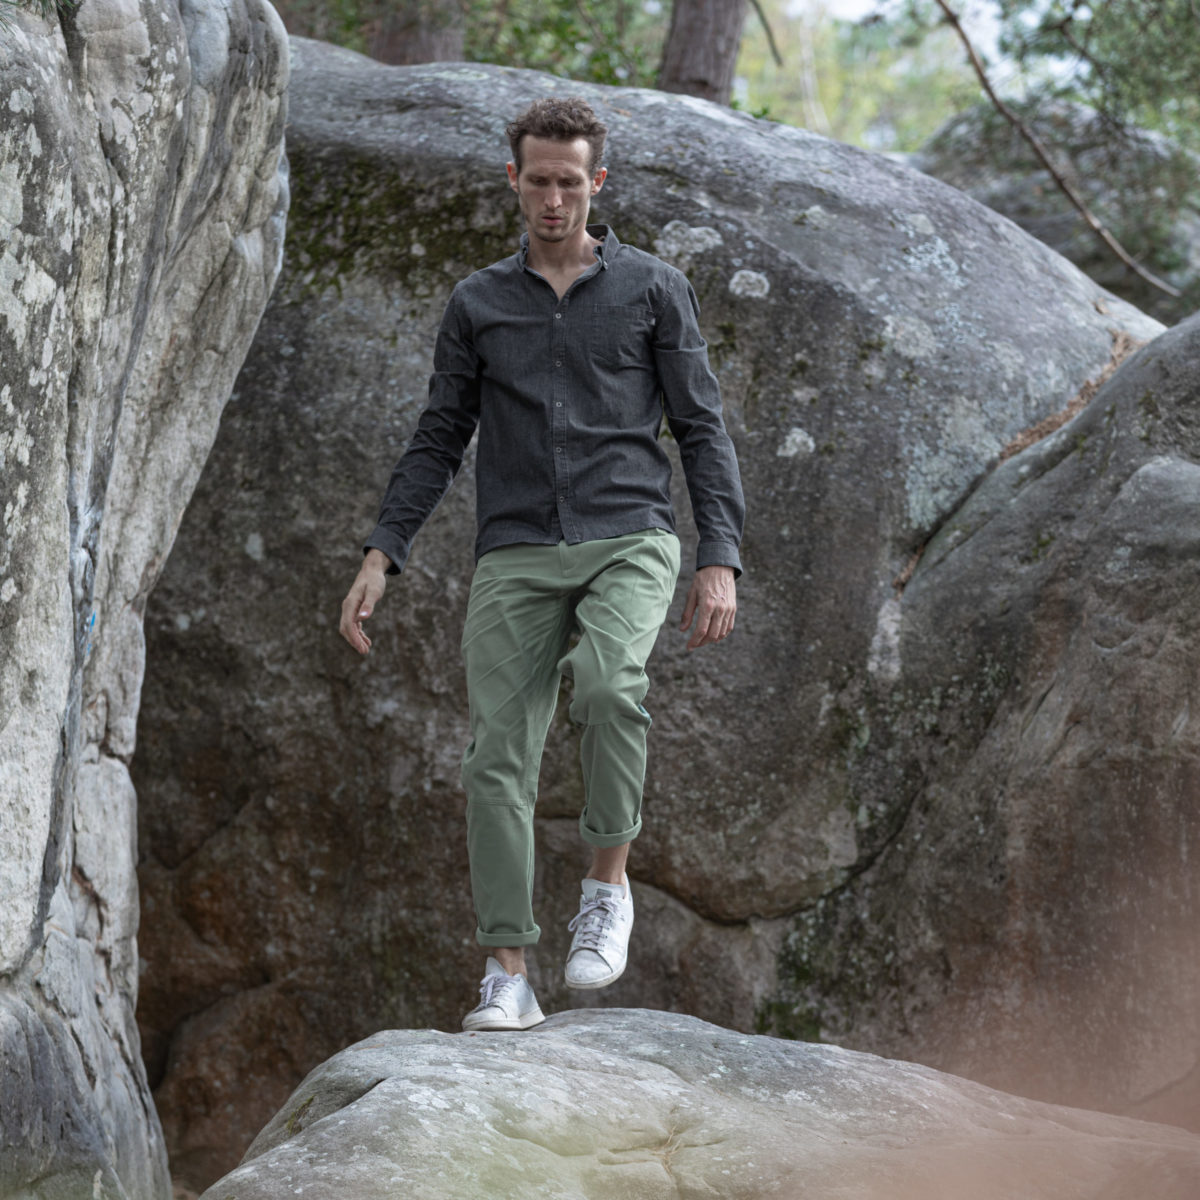 jeans shirt for climbing